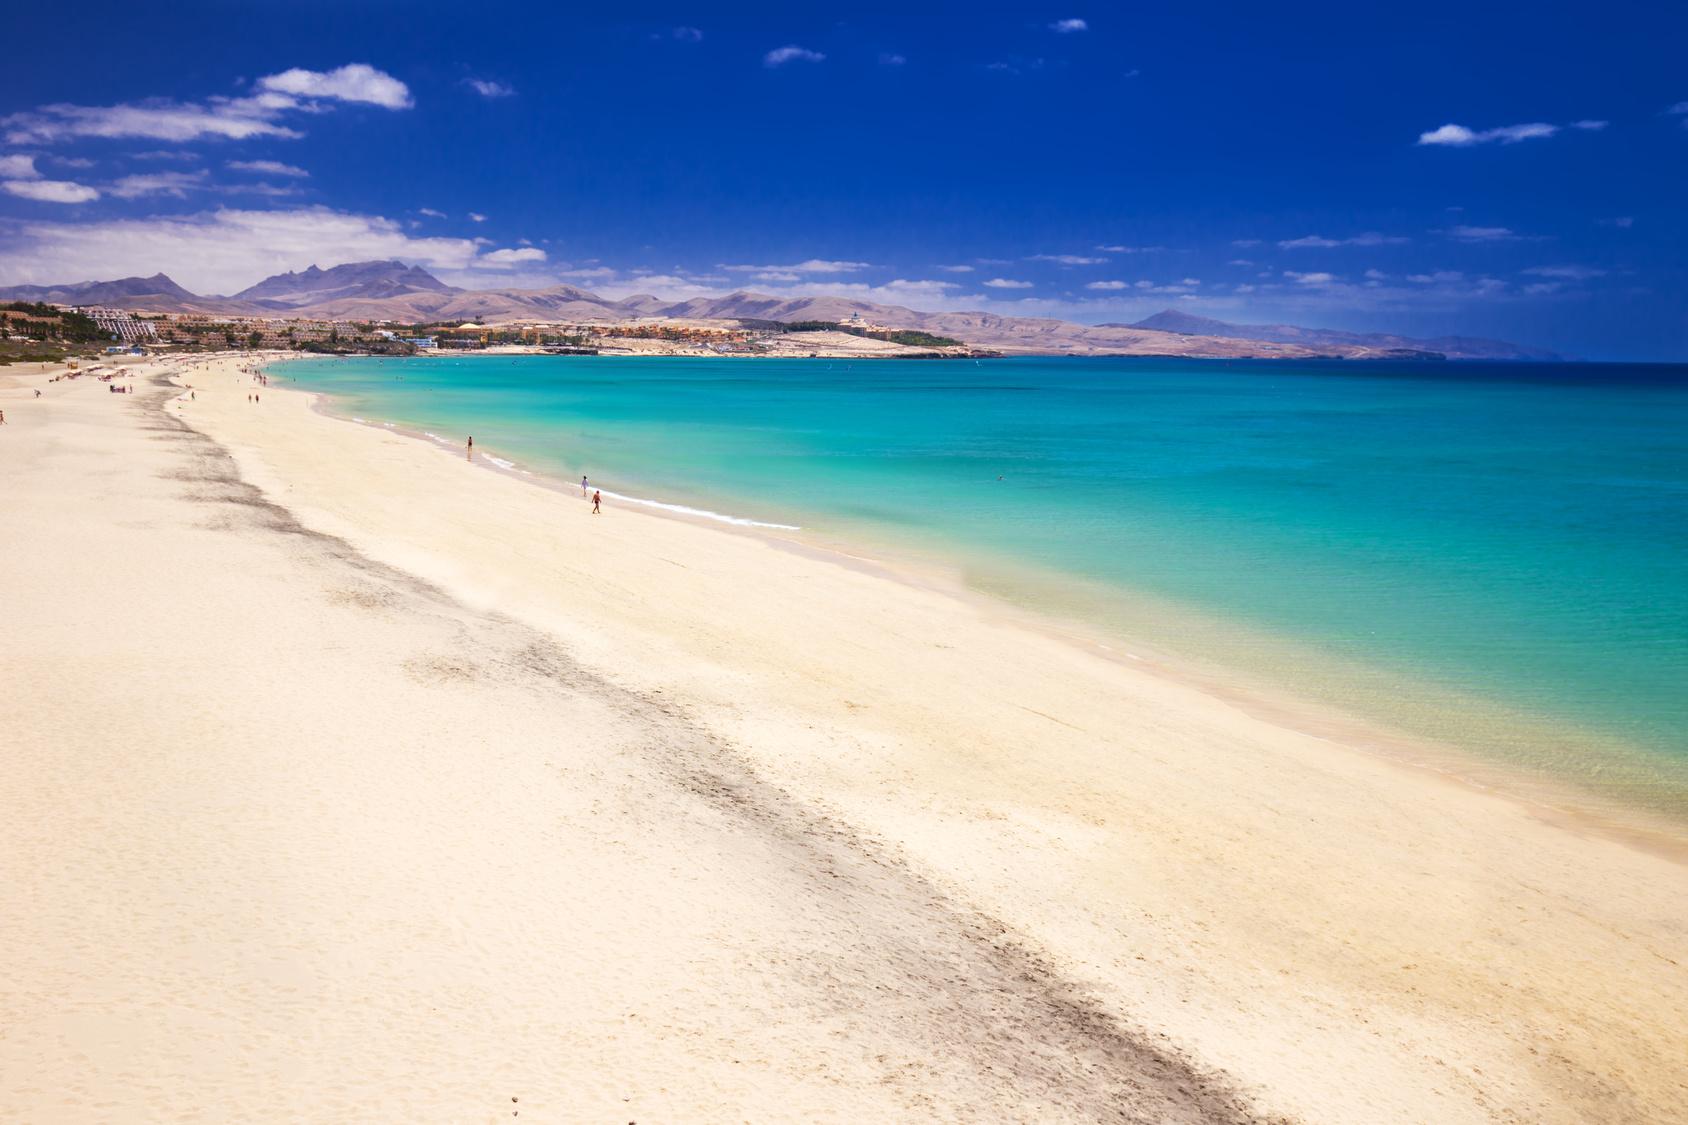 Costa Calma, Fuerteventura, Canarias